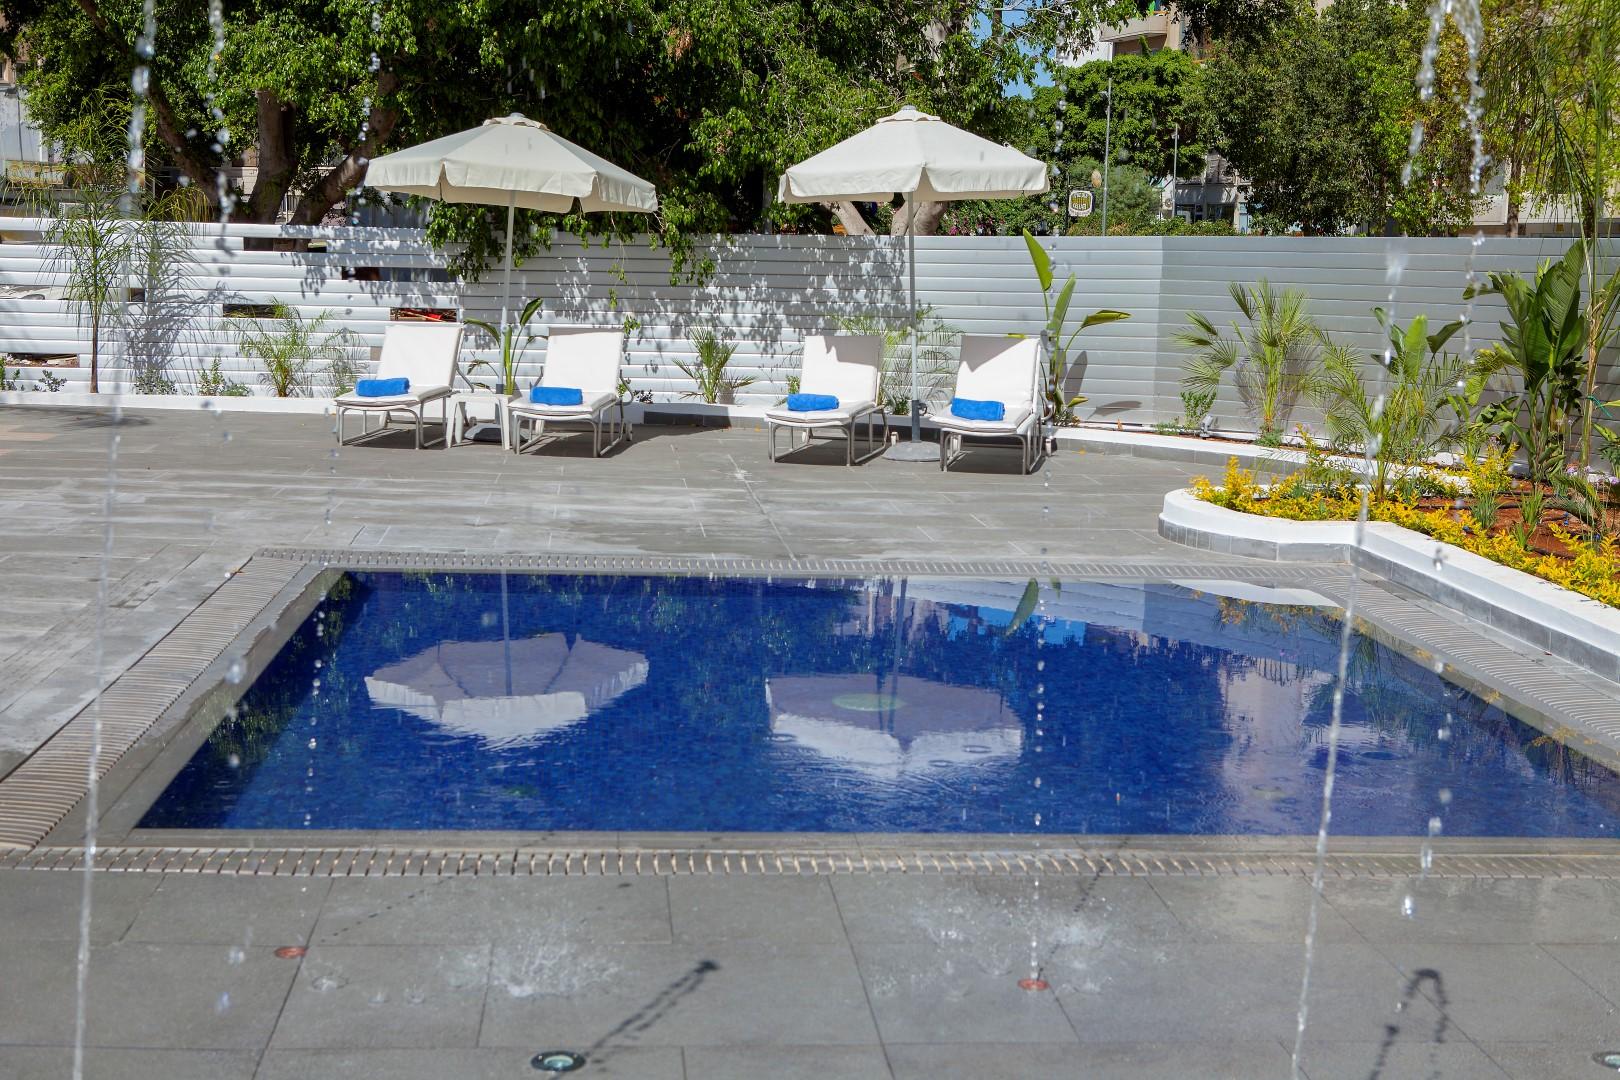 Leisure kapetanios hotels for International pool and spa show 2016